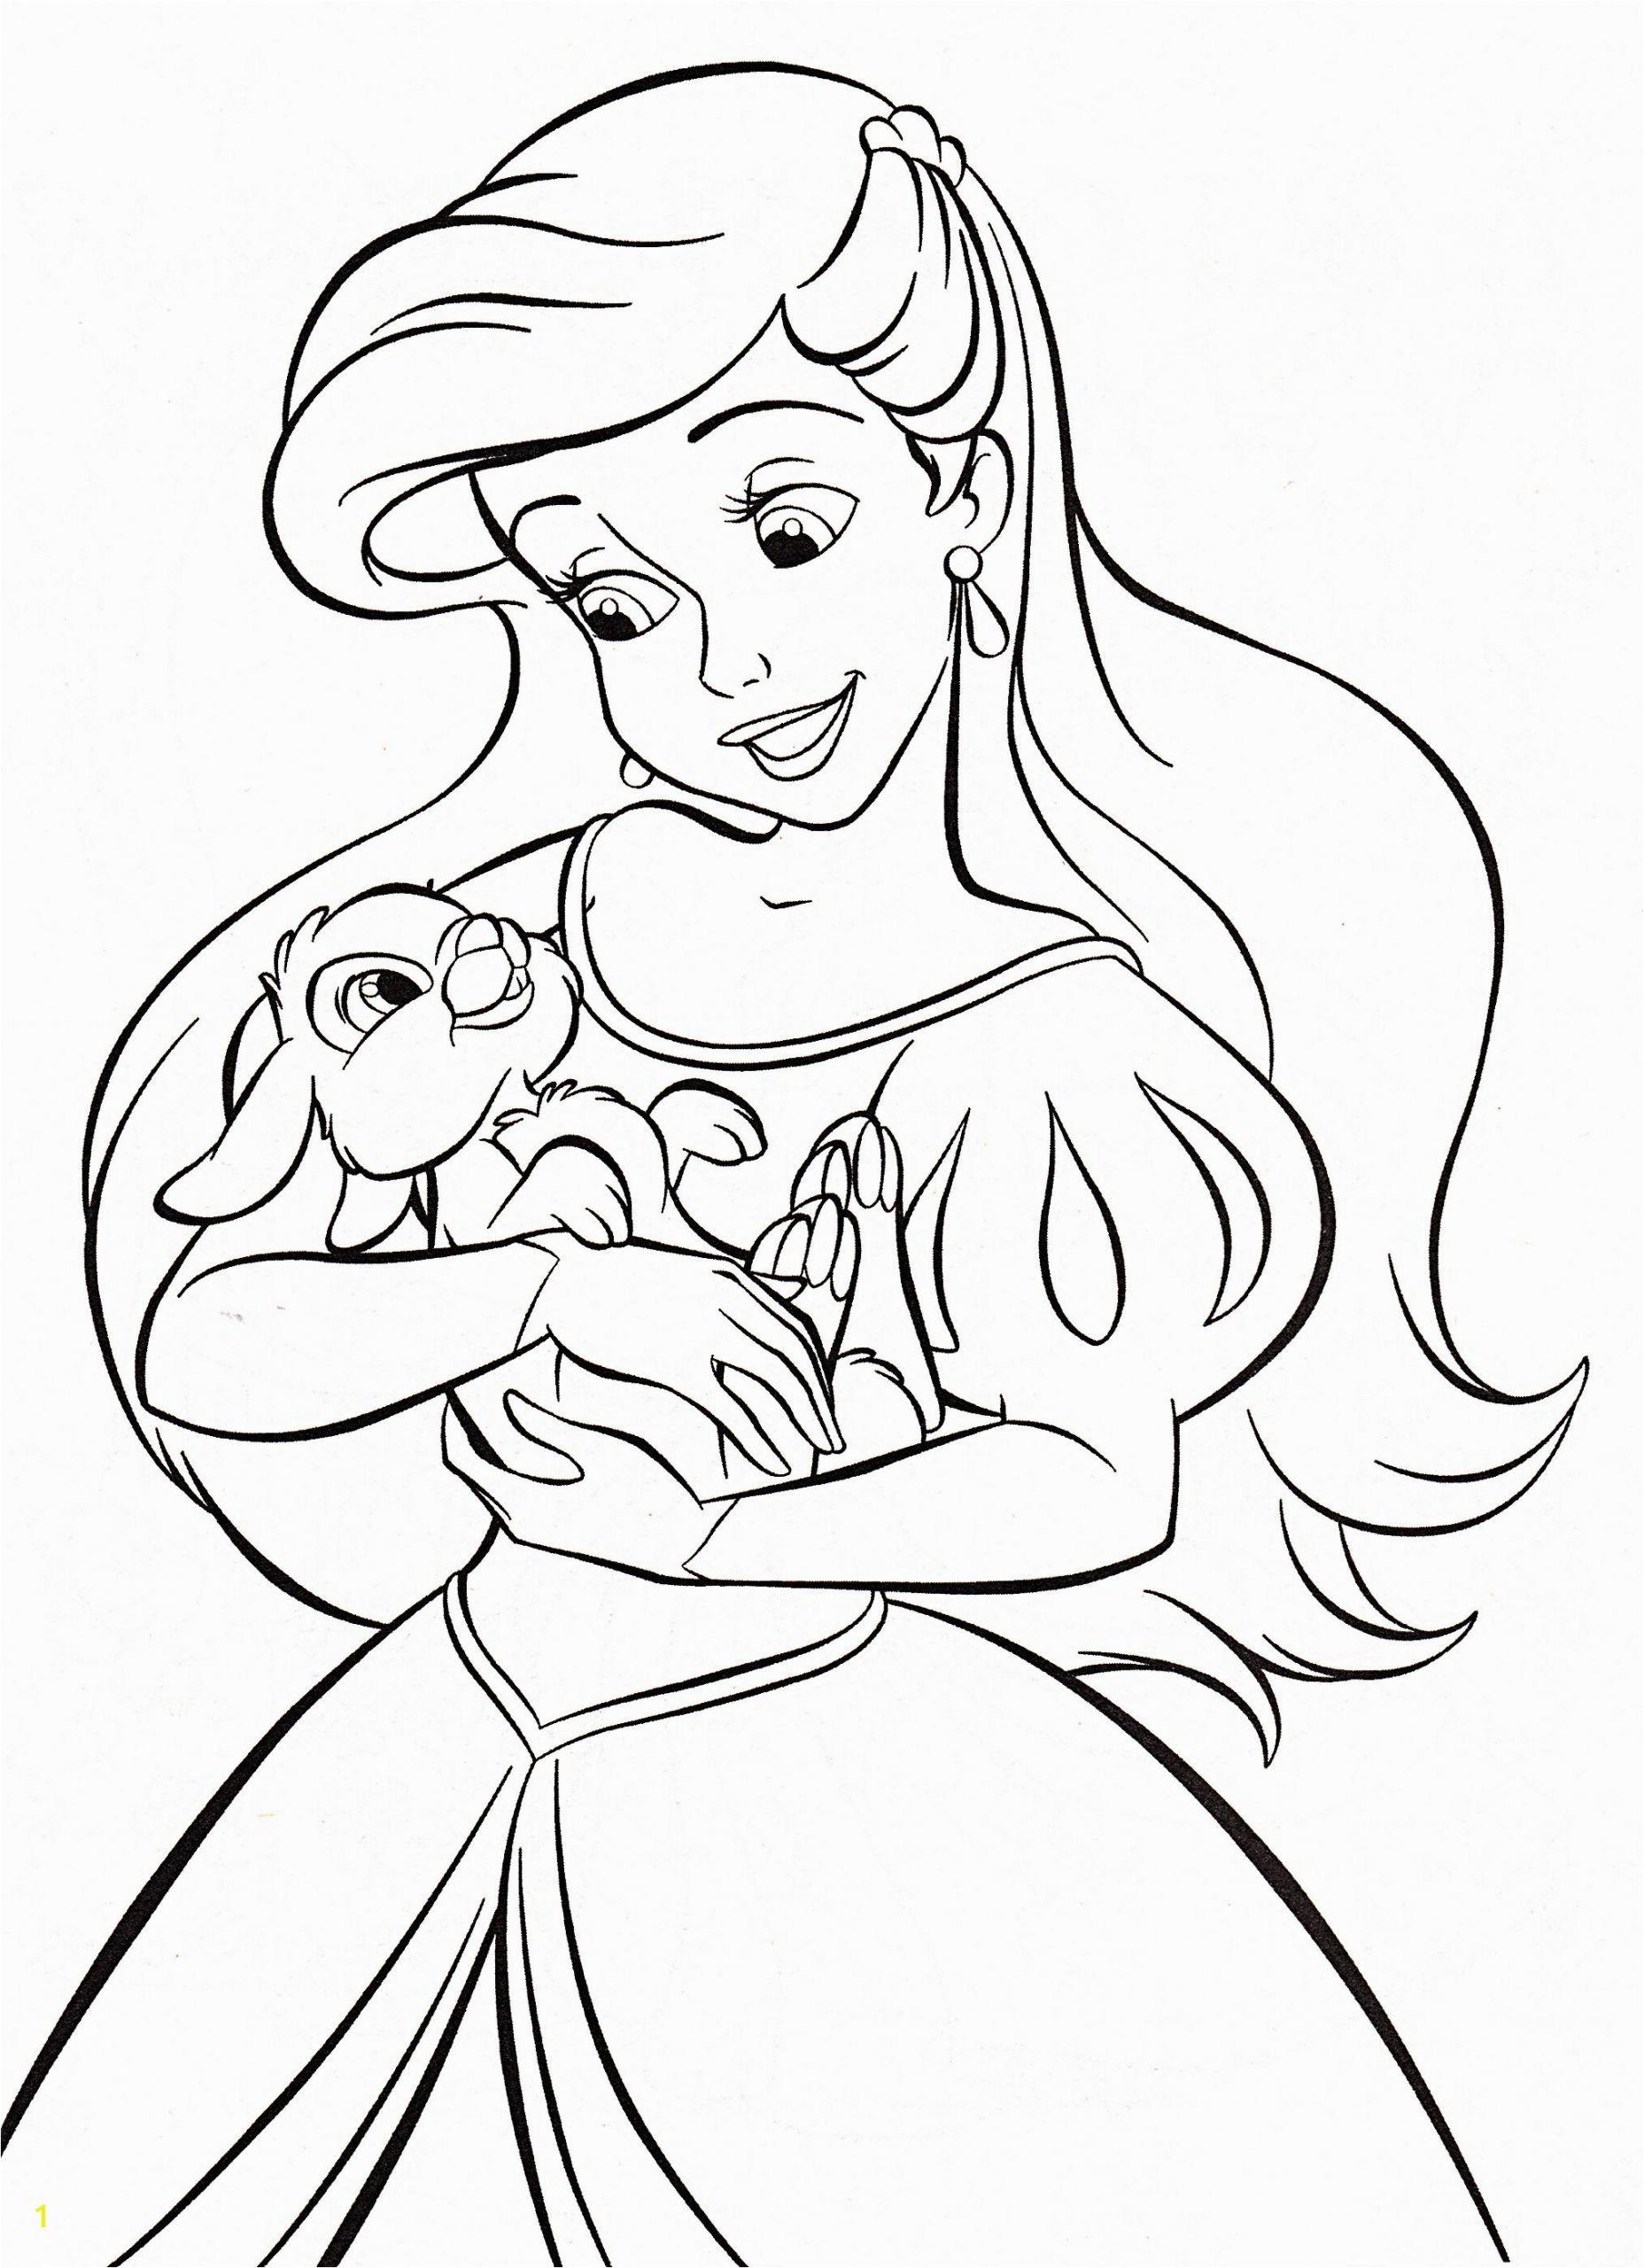 Walt Disney Princesses Coloring Pages Of Walt Disney Coloring Pages Princess Ariel for